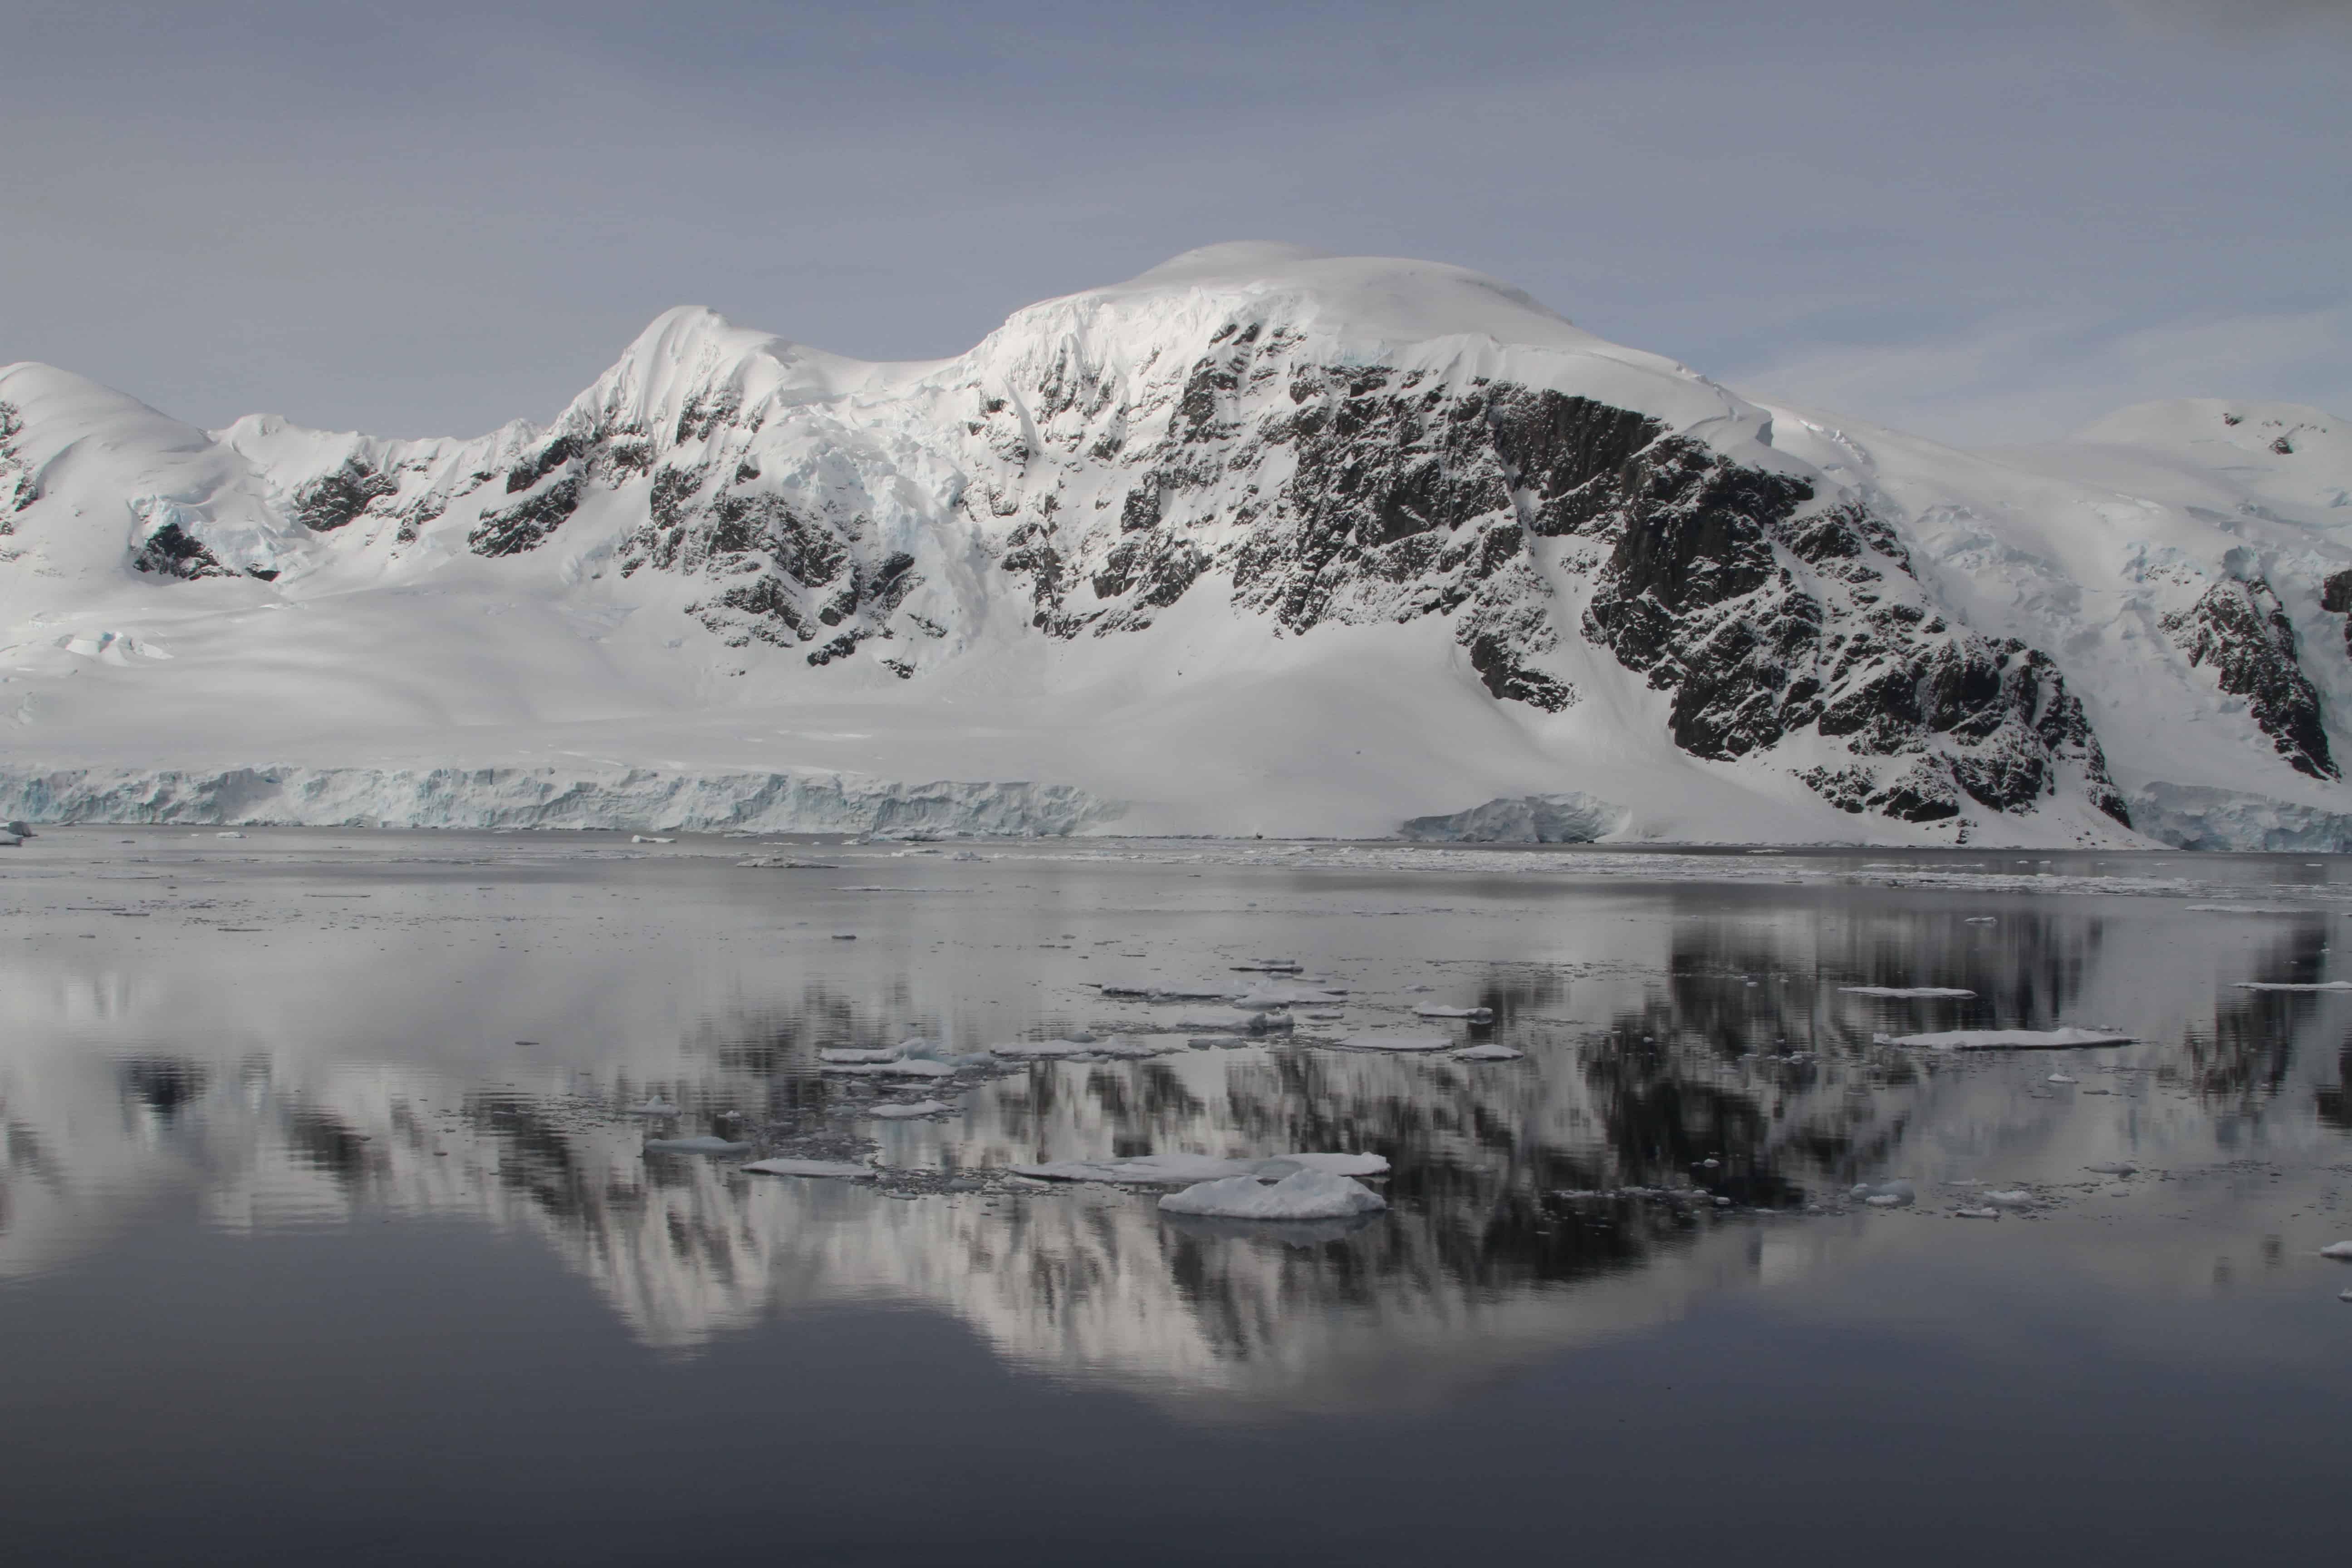 NW Antarctic Peninsula. Copyright: Dr Mike Pienkowski